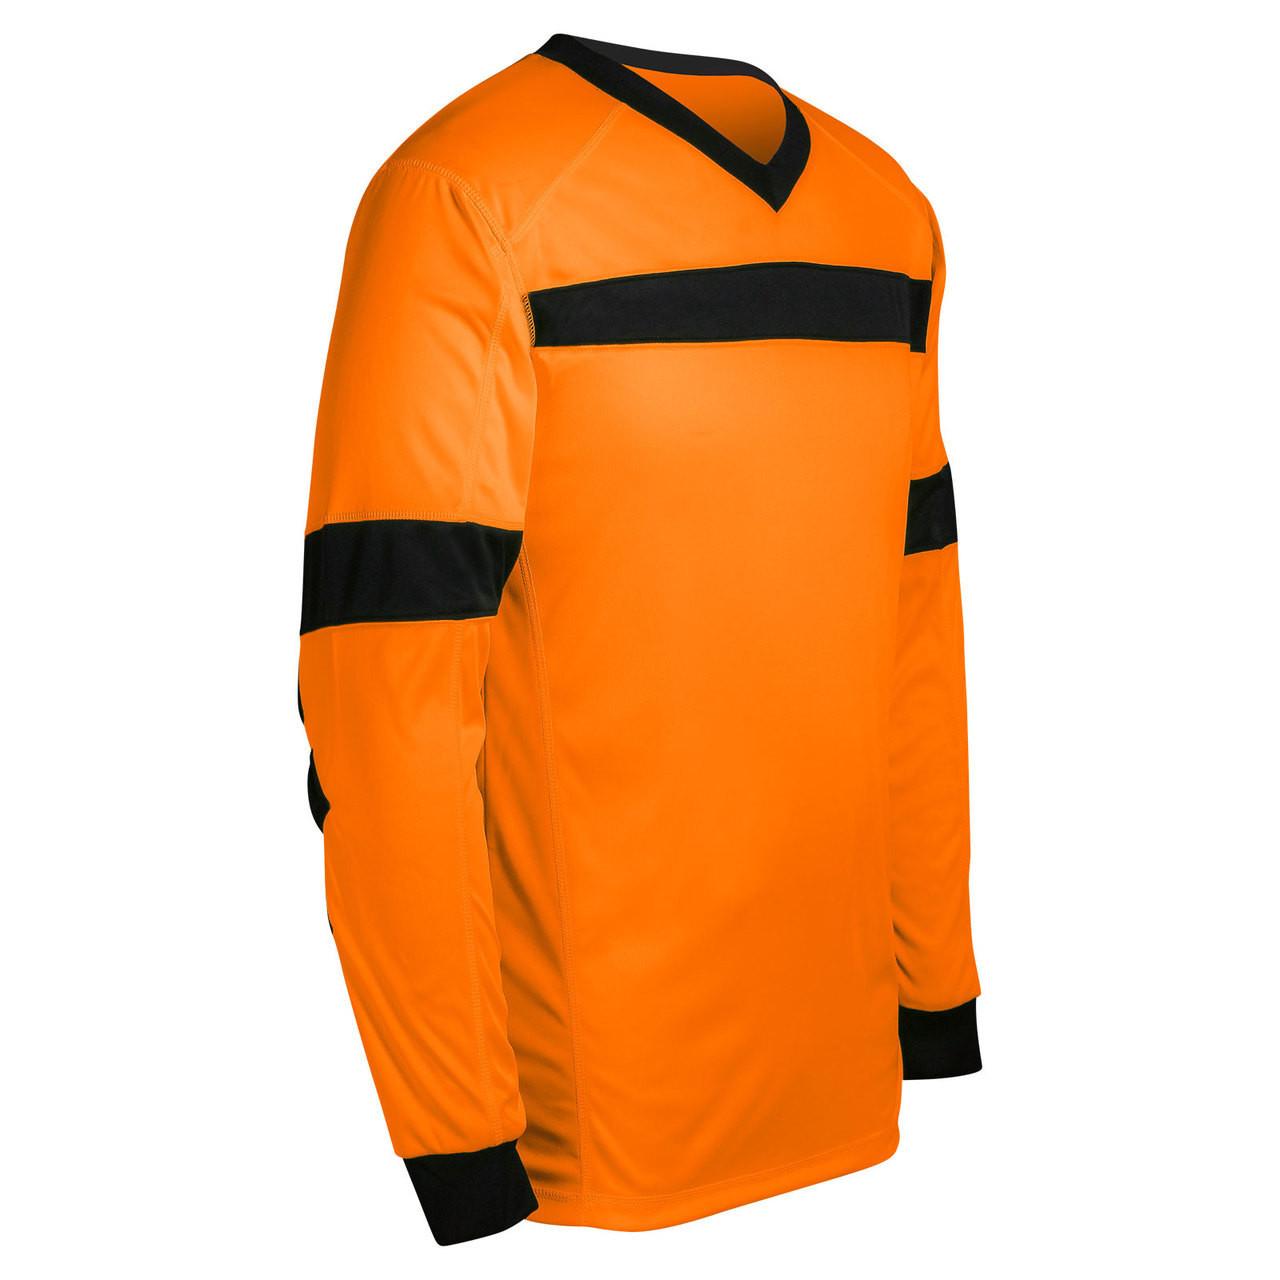 d65e370f63f Champro Keeper Soccer Goalie Jersey - Athletic Stuff